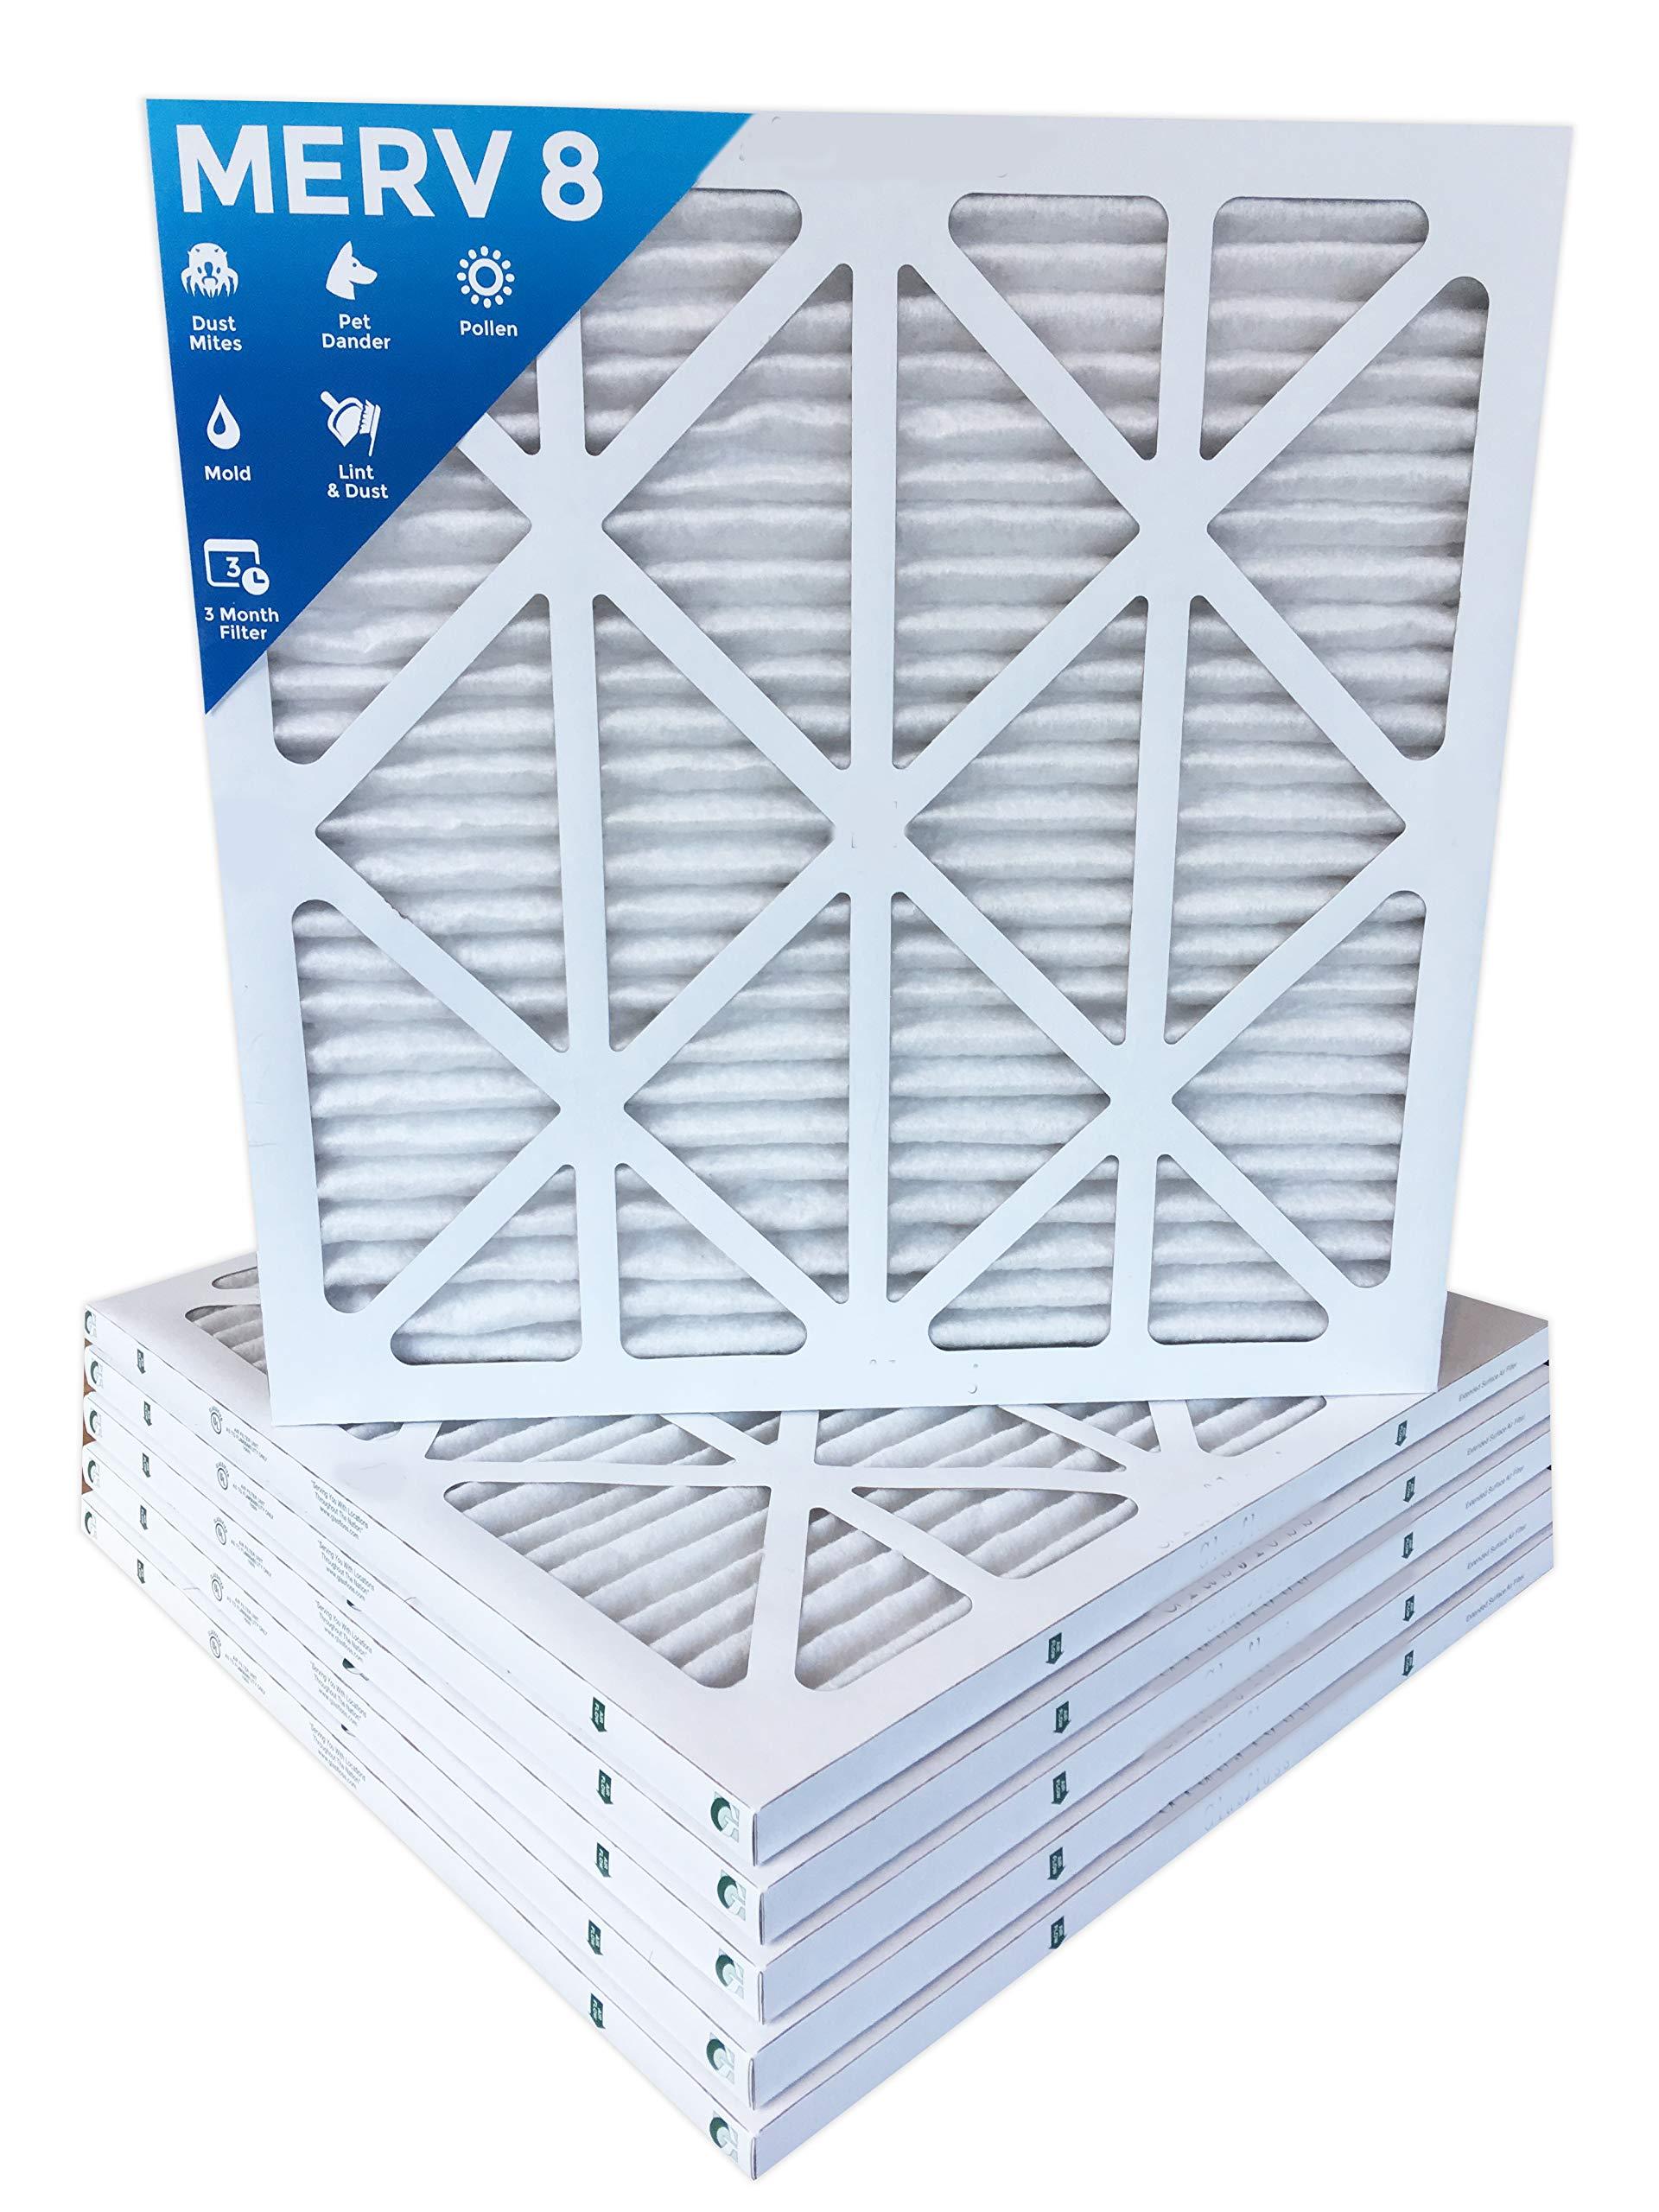 20x20x1 MERV 8 Pleated AC Furnace Air Filters. 12 PACK